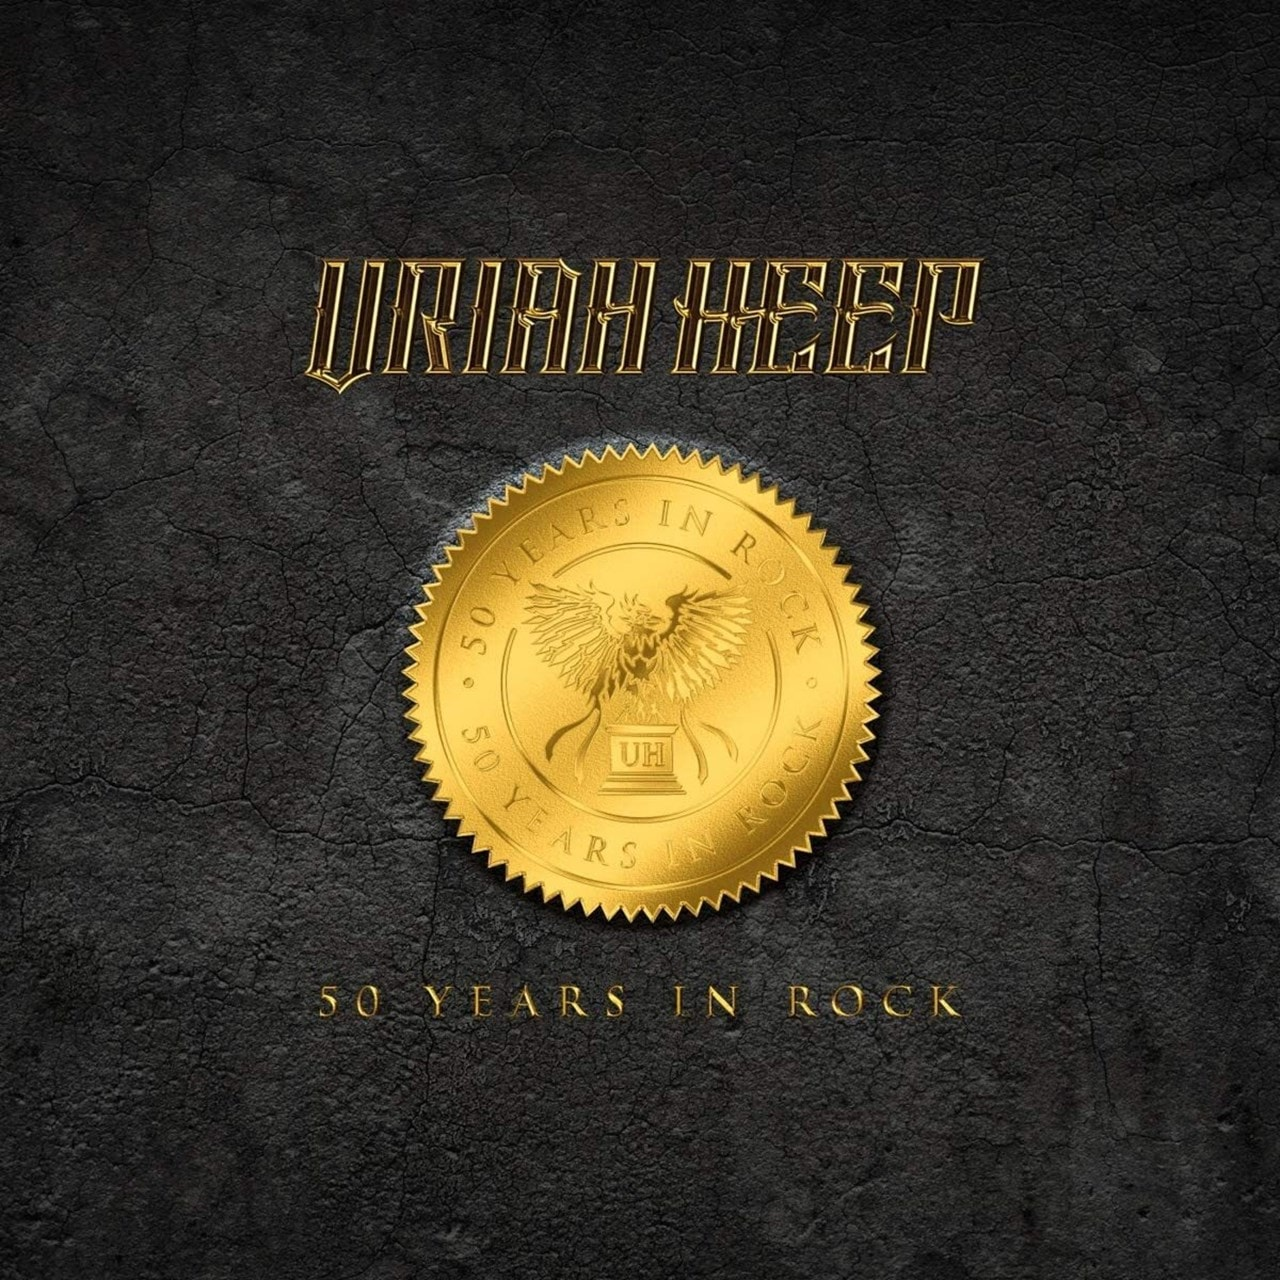 50 Years in Rock - 1